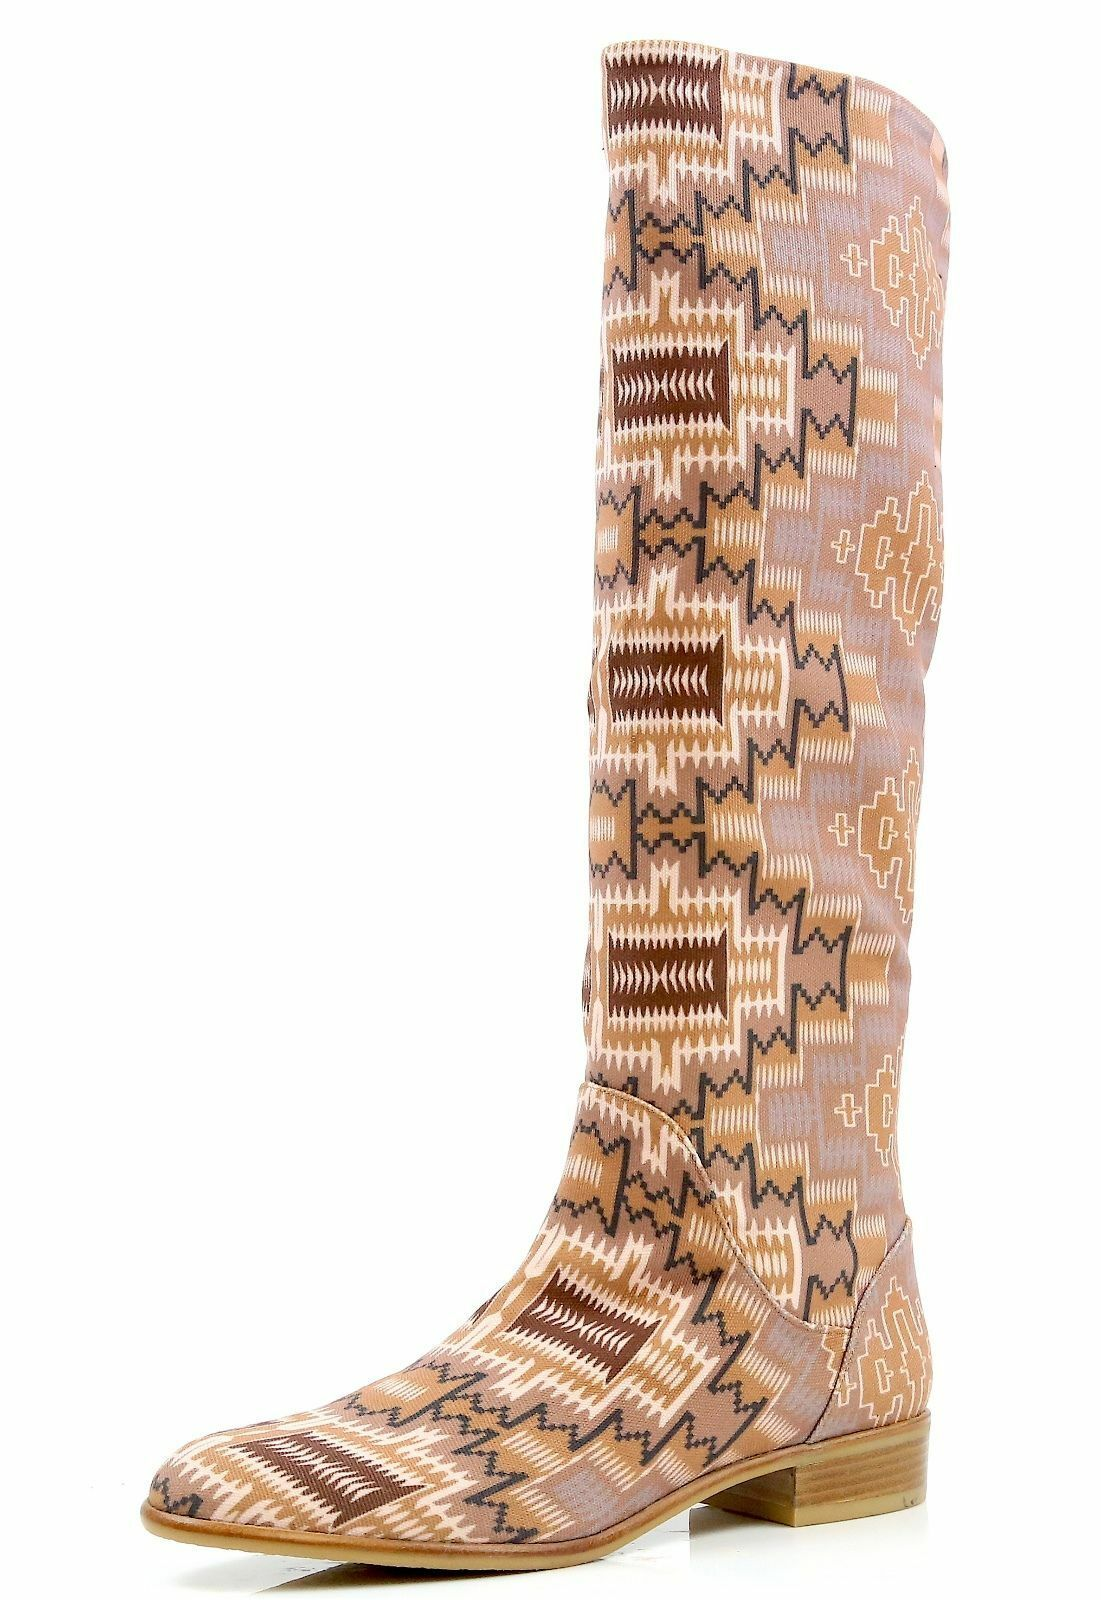 New! Stuart Weitzman Classique Tan Maya Linen Multi Color Boots Size 7.5 M E9474